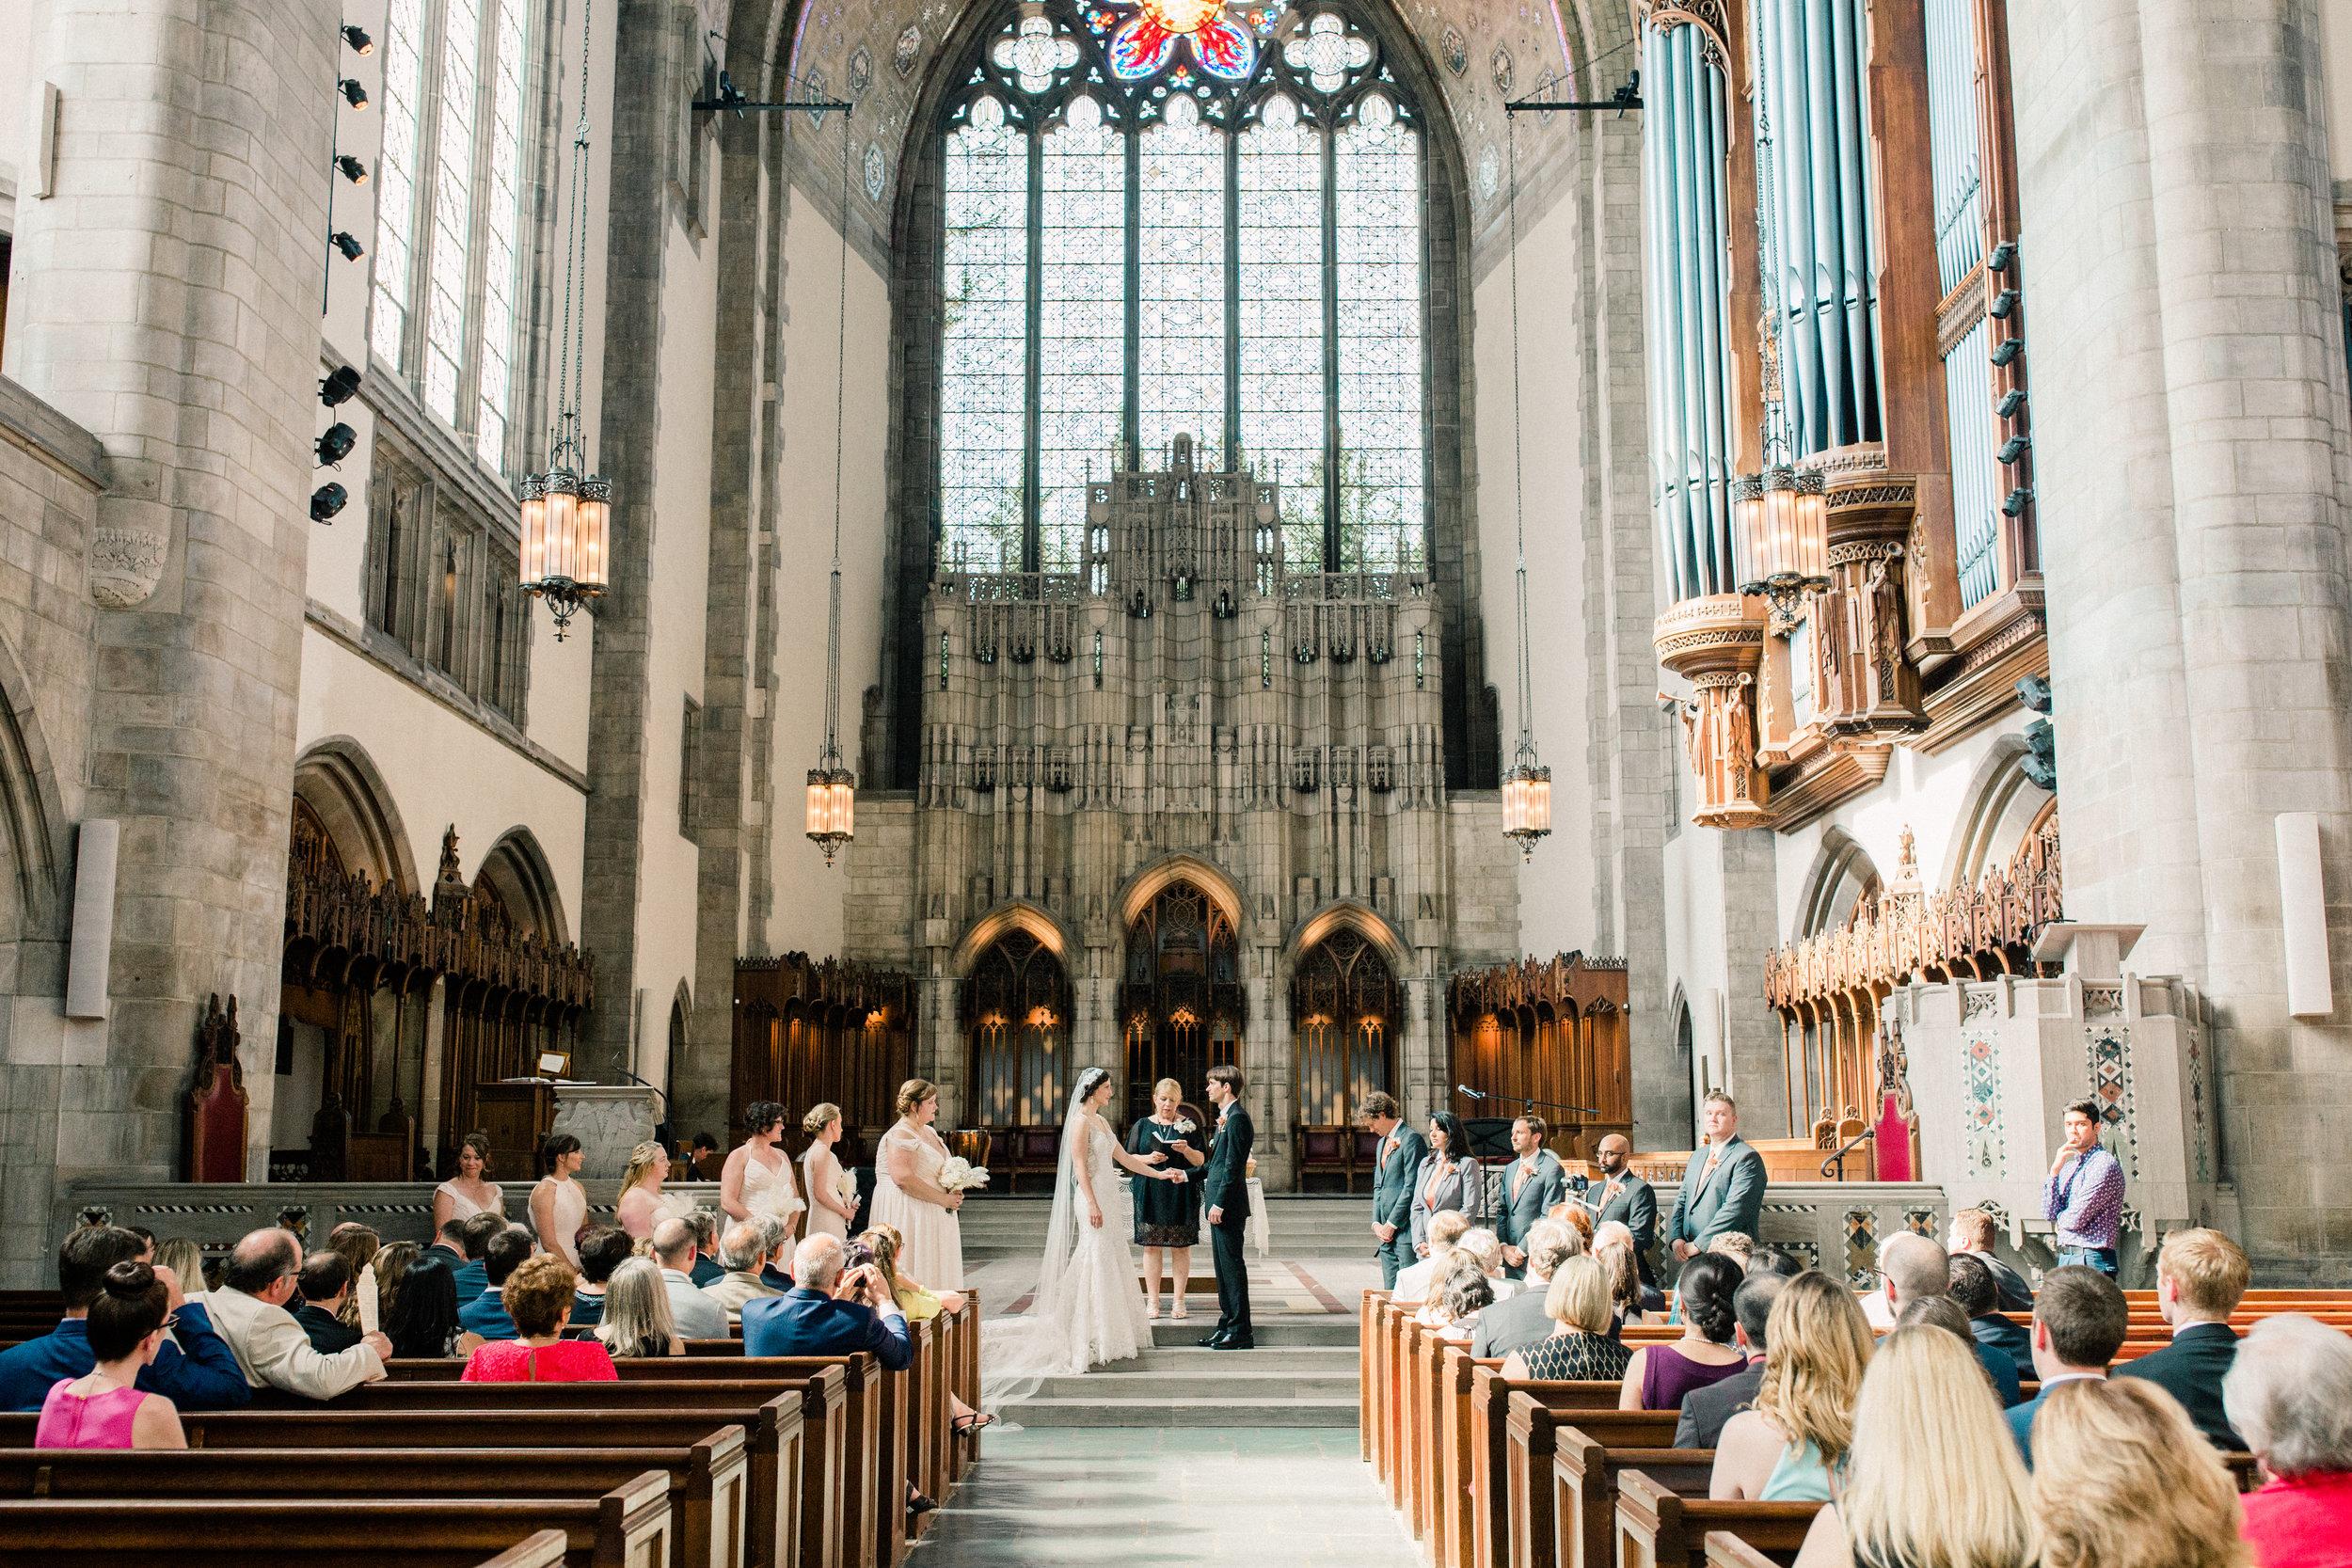 Dorothy_Louise_Photography_University_of_Chicago_Chapel_Wedding-30.jpg